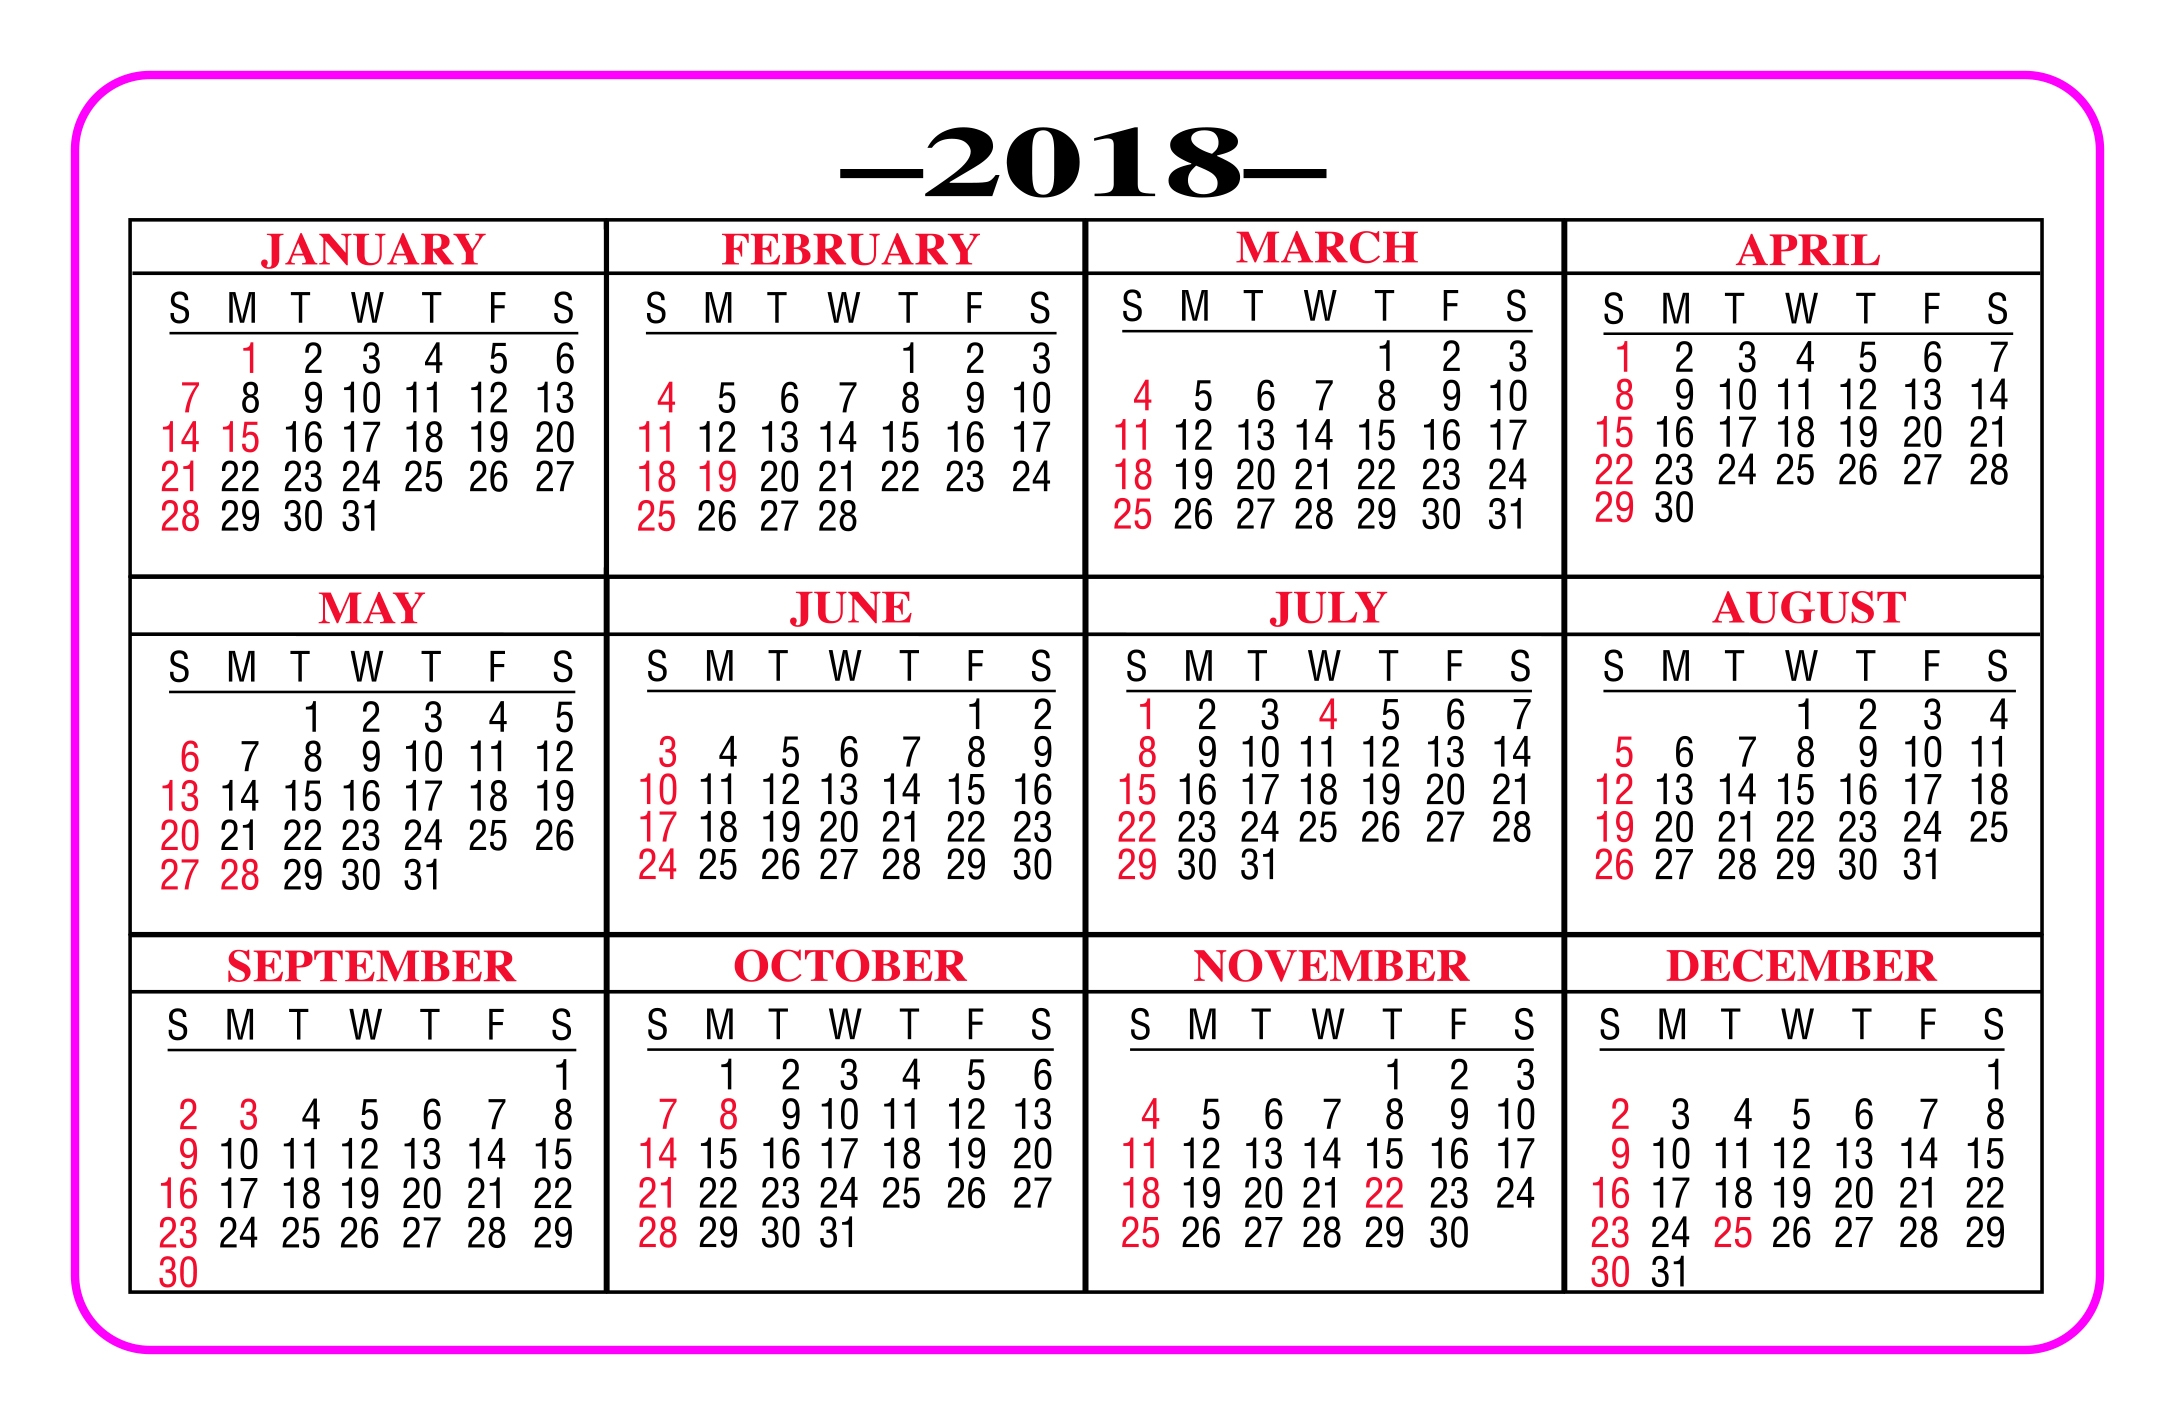 Promotional Laminated Wallet Cards Wallet Calendar Cards  Xjb